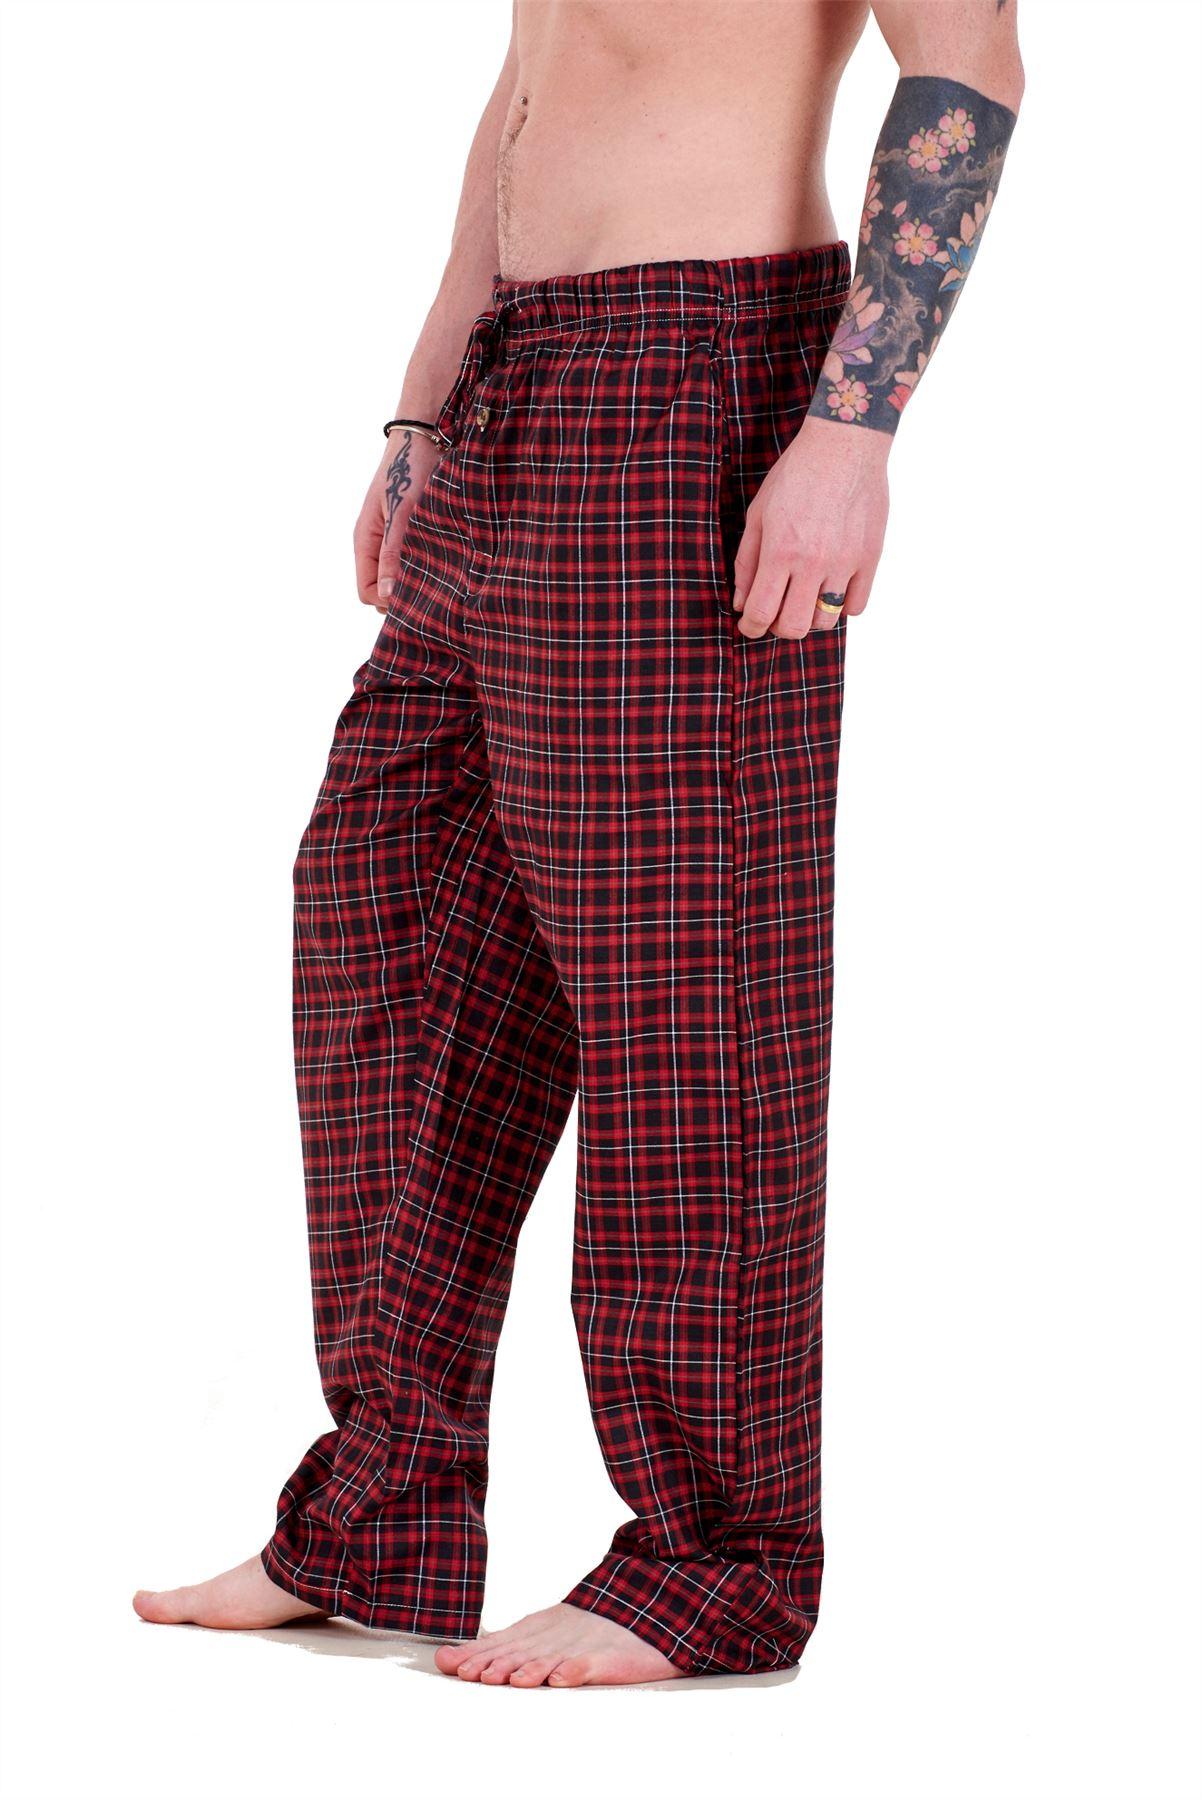 Mens-Pyjama-Bottoms-Rich-Cotton-Woven-Check-Lounge-Pant-Nightwear-Big-3XL-to-5XL Indexbild 56